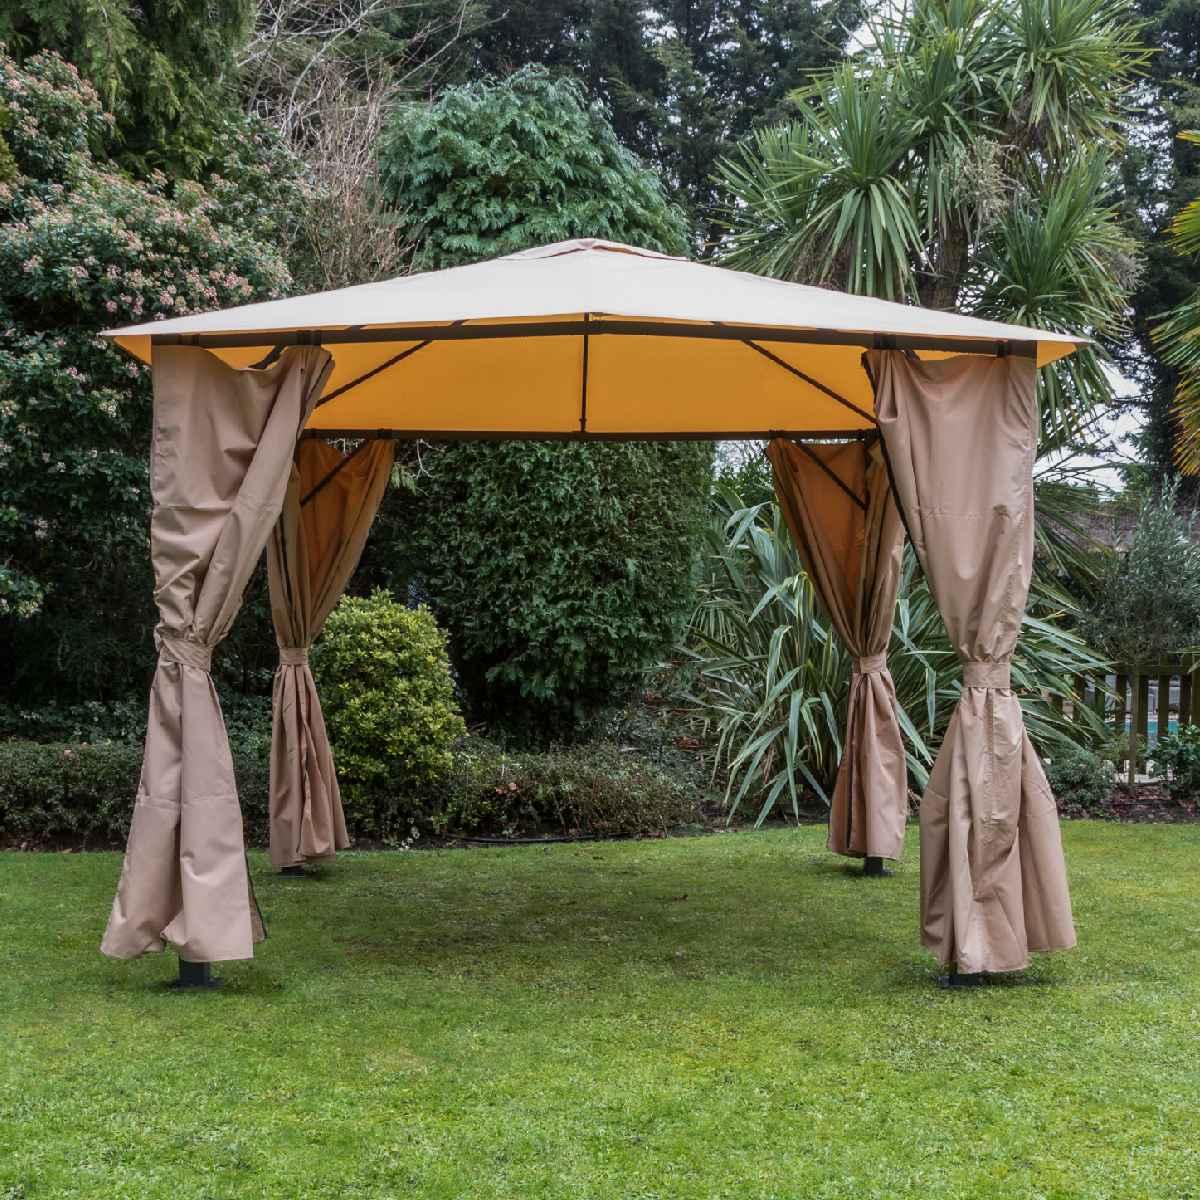 Katie Blake Eden 2.5m x 2.5m Gazebo With Curtains - Taupe